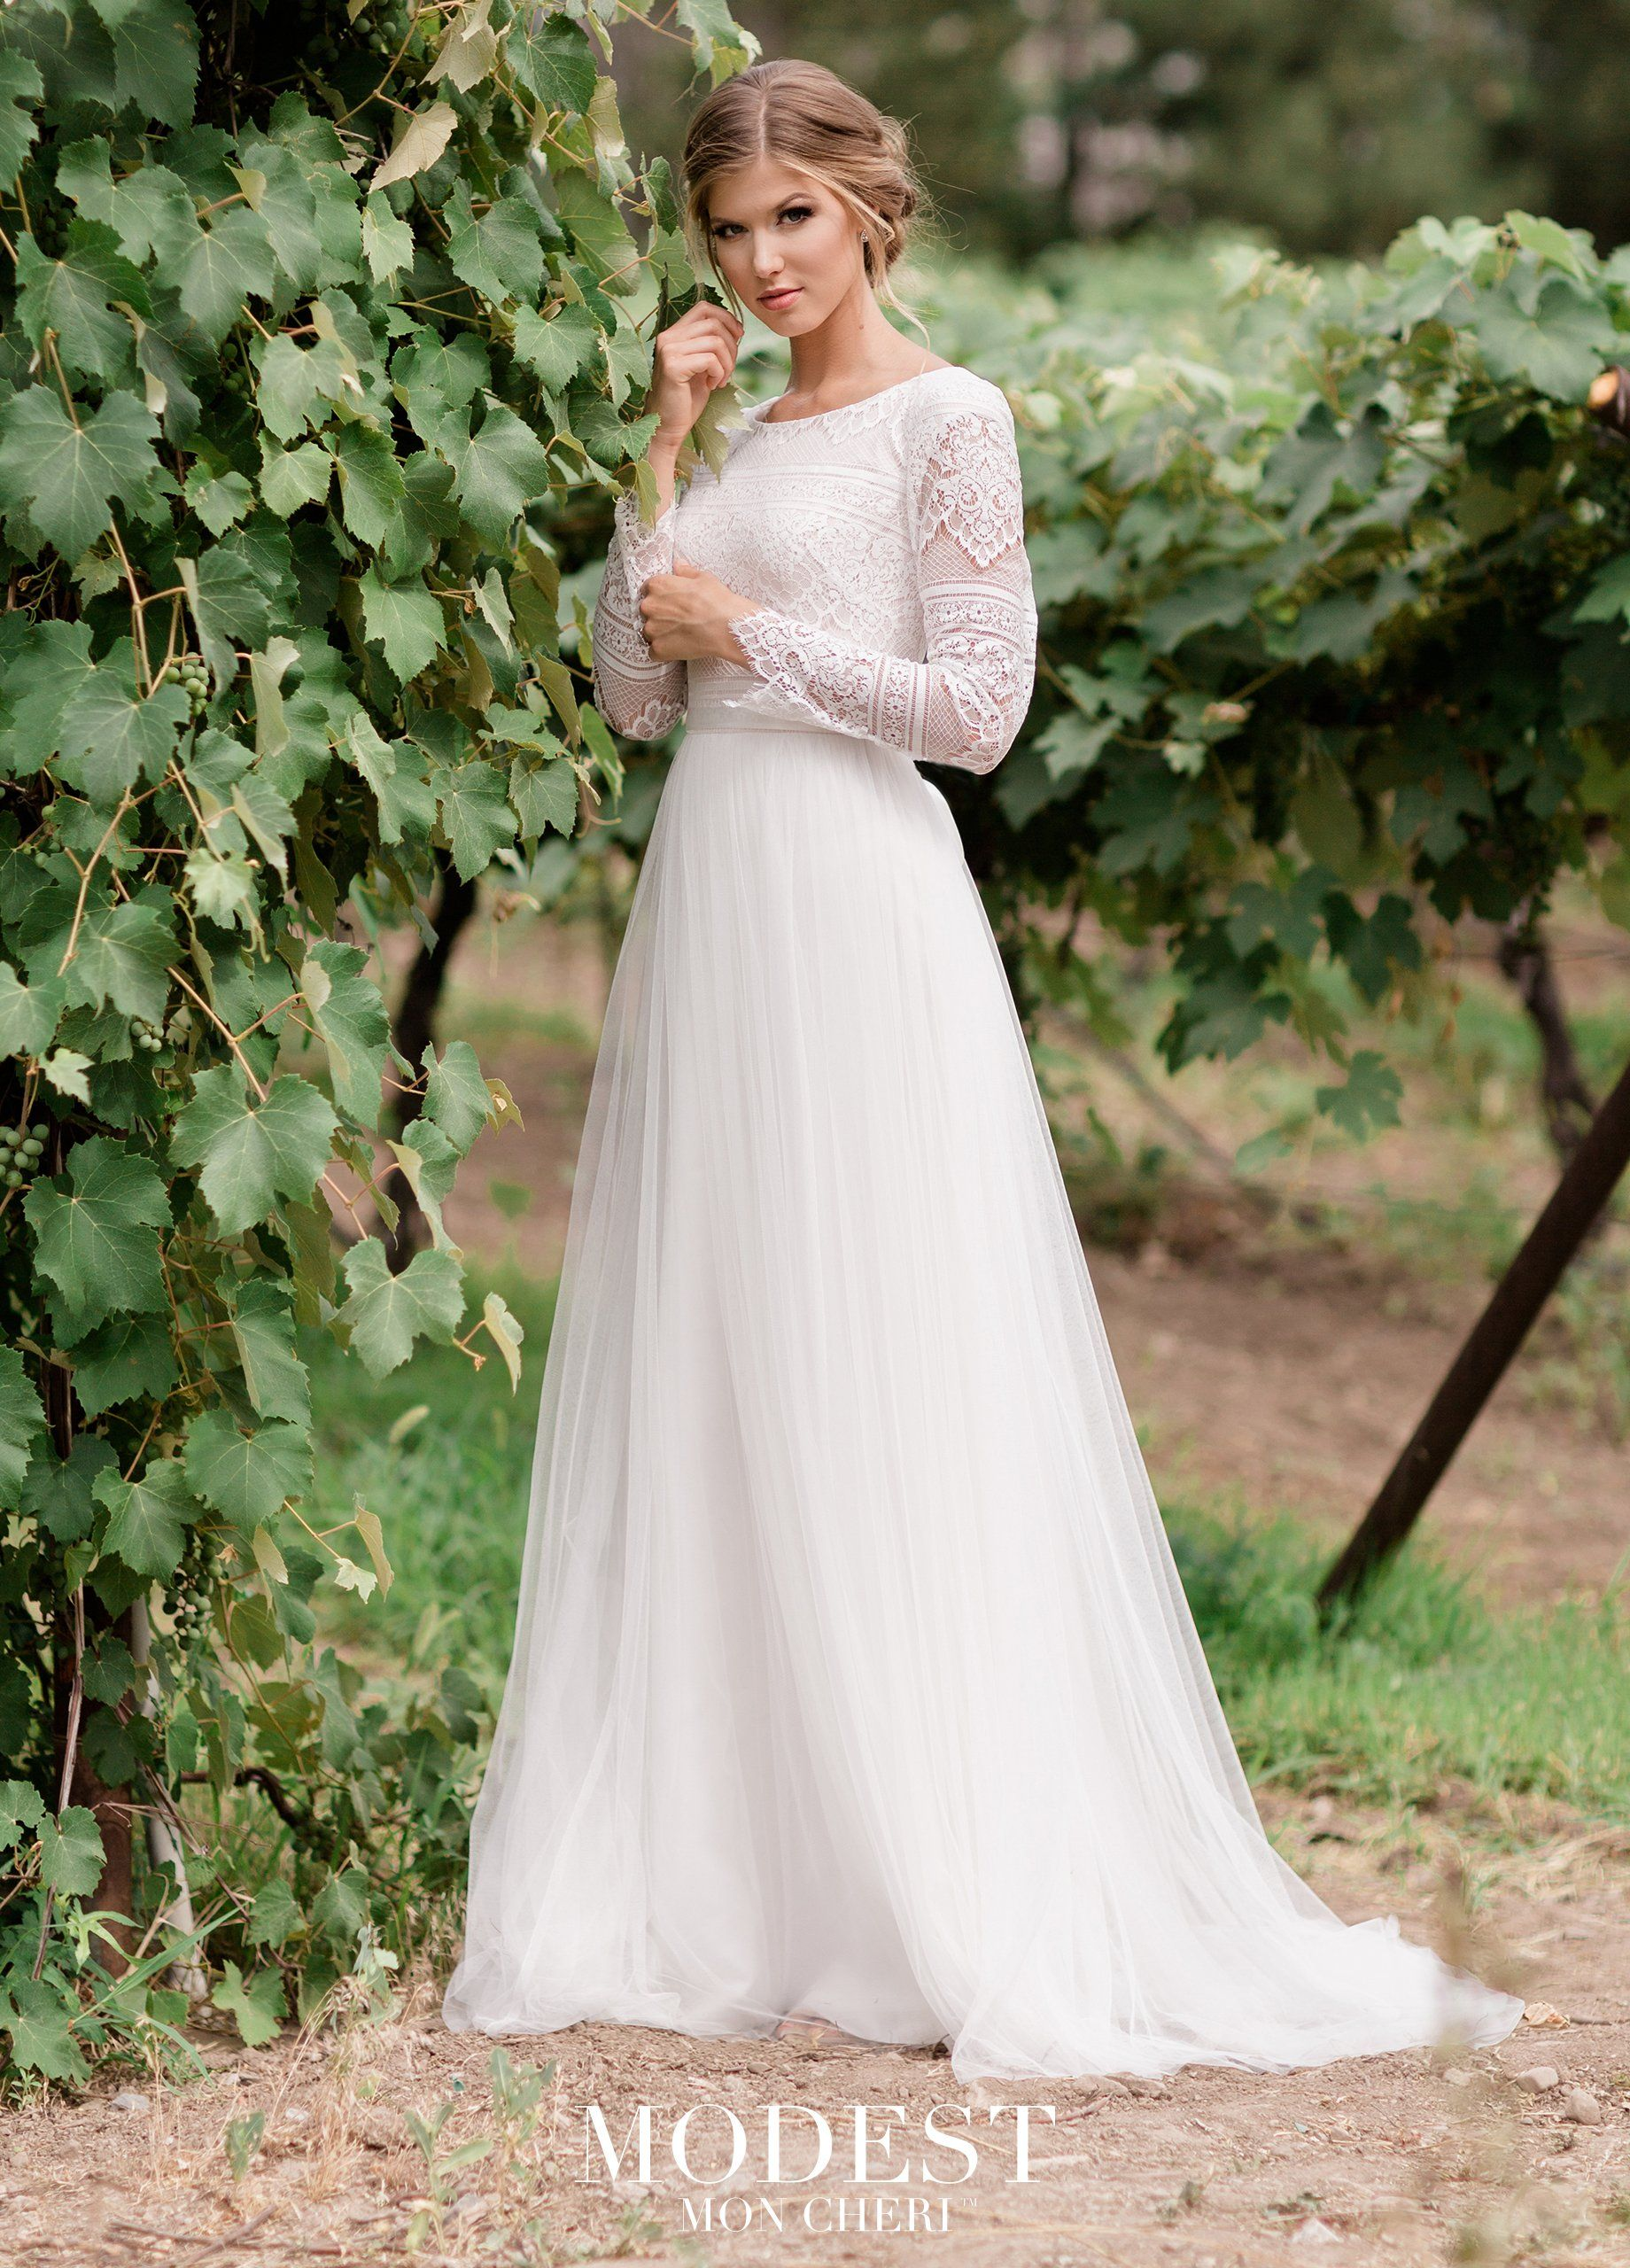 Mon Cheri Tr11976 Modest Wedding Dresses Mon Cheri Wedding Dresses Wedding Dresses Lace [ 2560 x 1840 Pixel ]